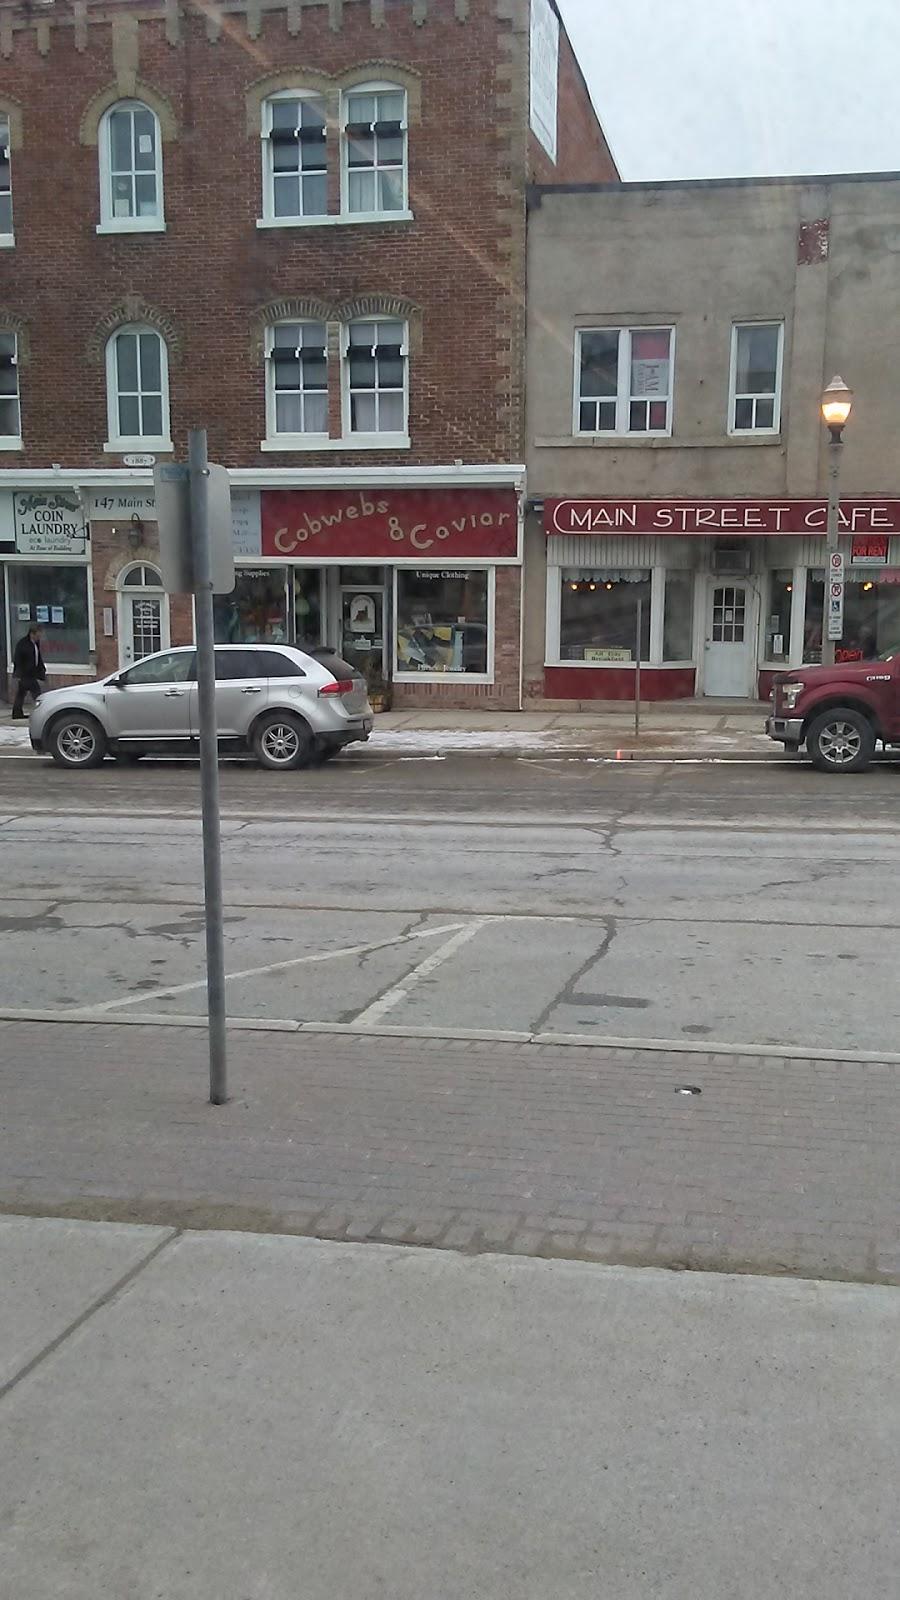 Cobwebs & Caviar   clothing store   147 Main St W, Shelburne, ON L9V 3K3, Canada   5193063000 OR +1 519-306-3000